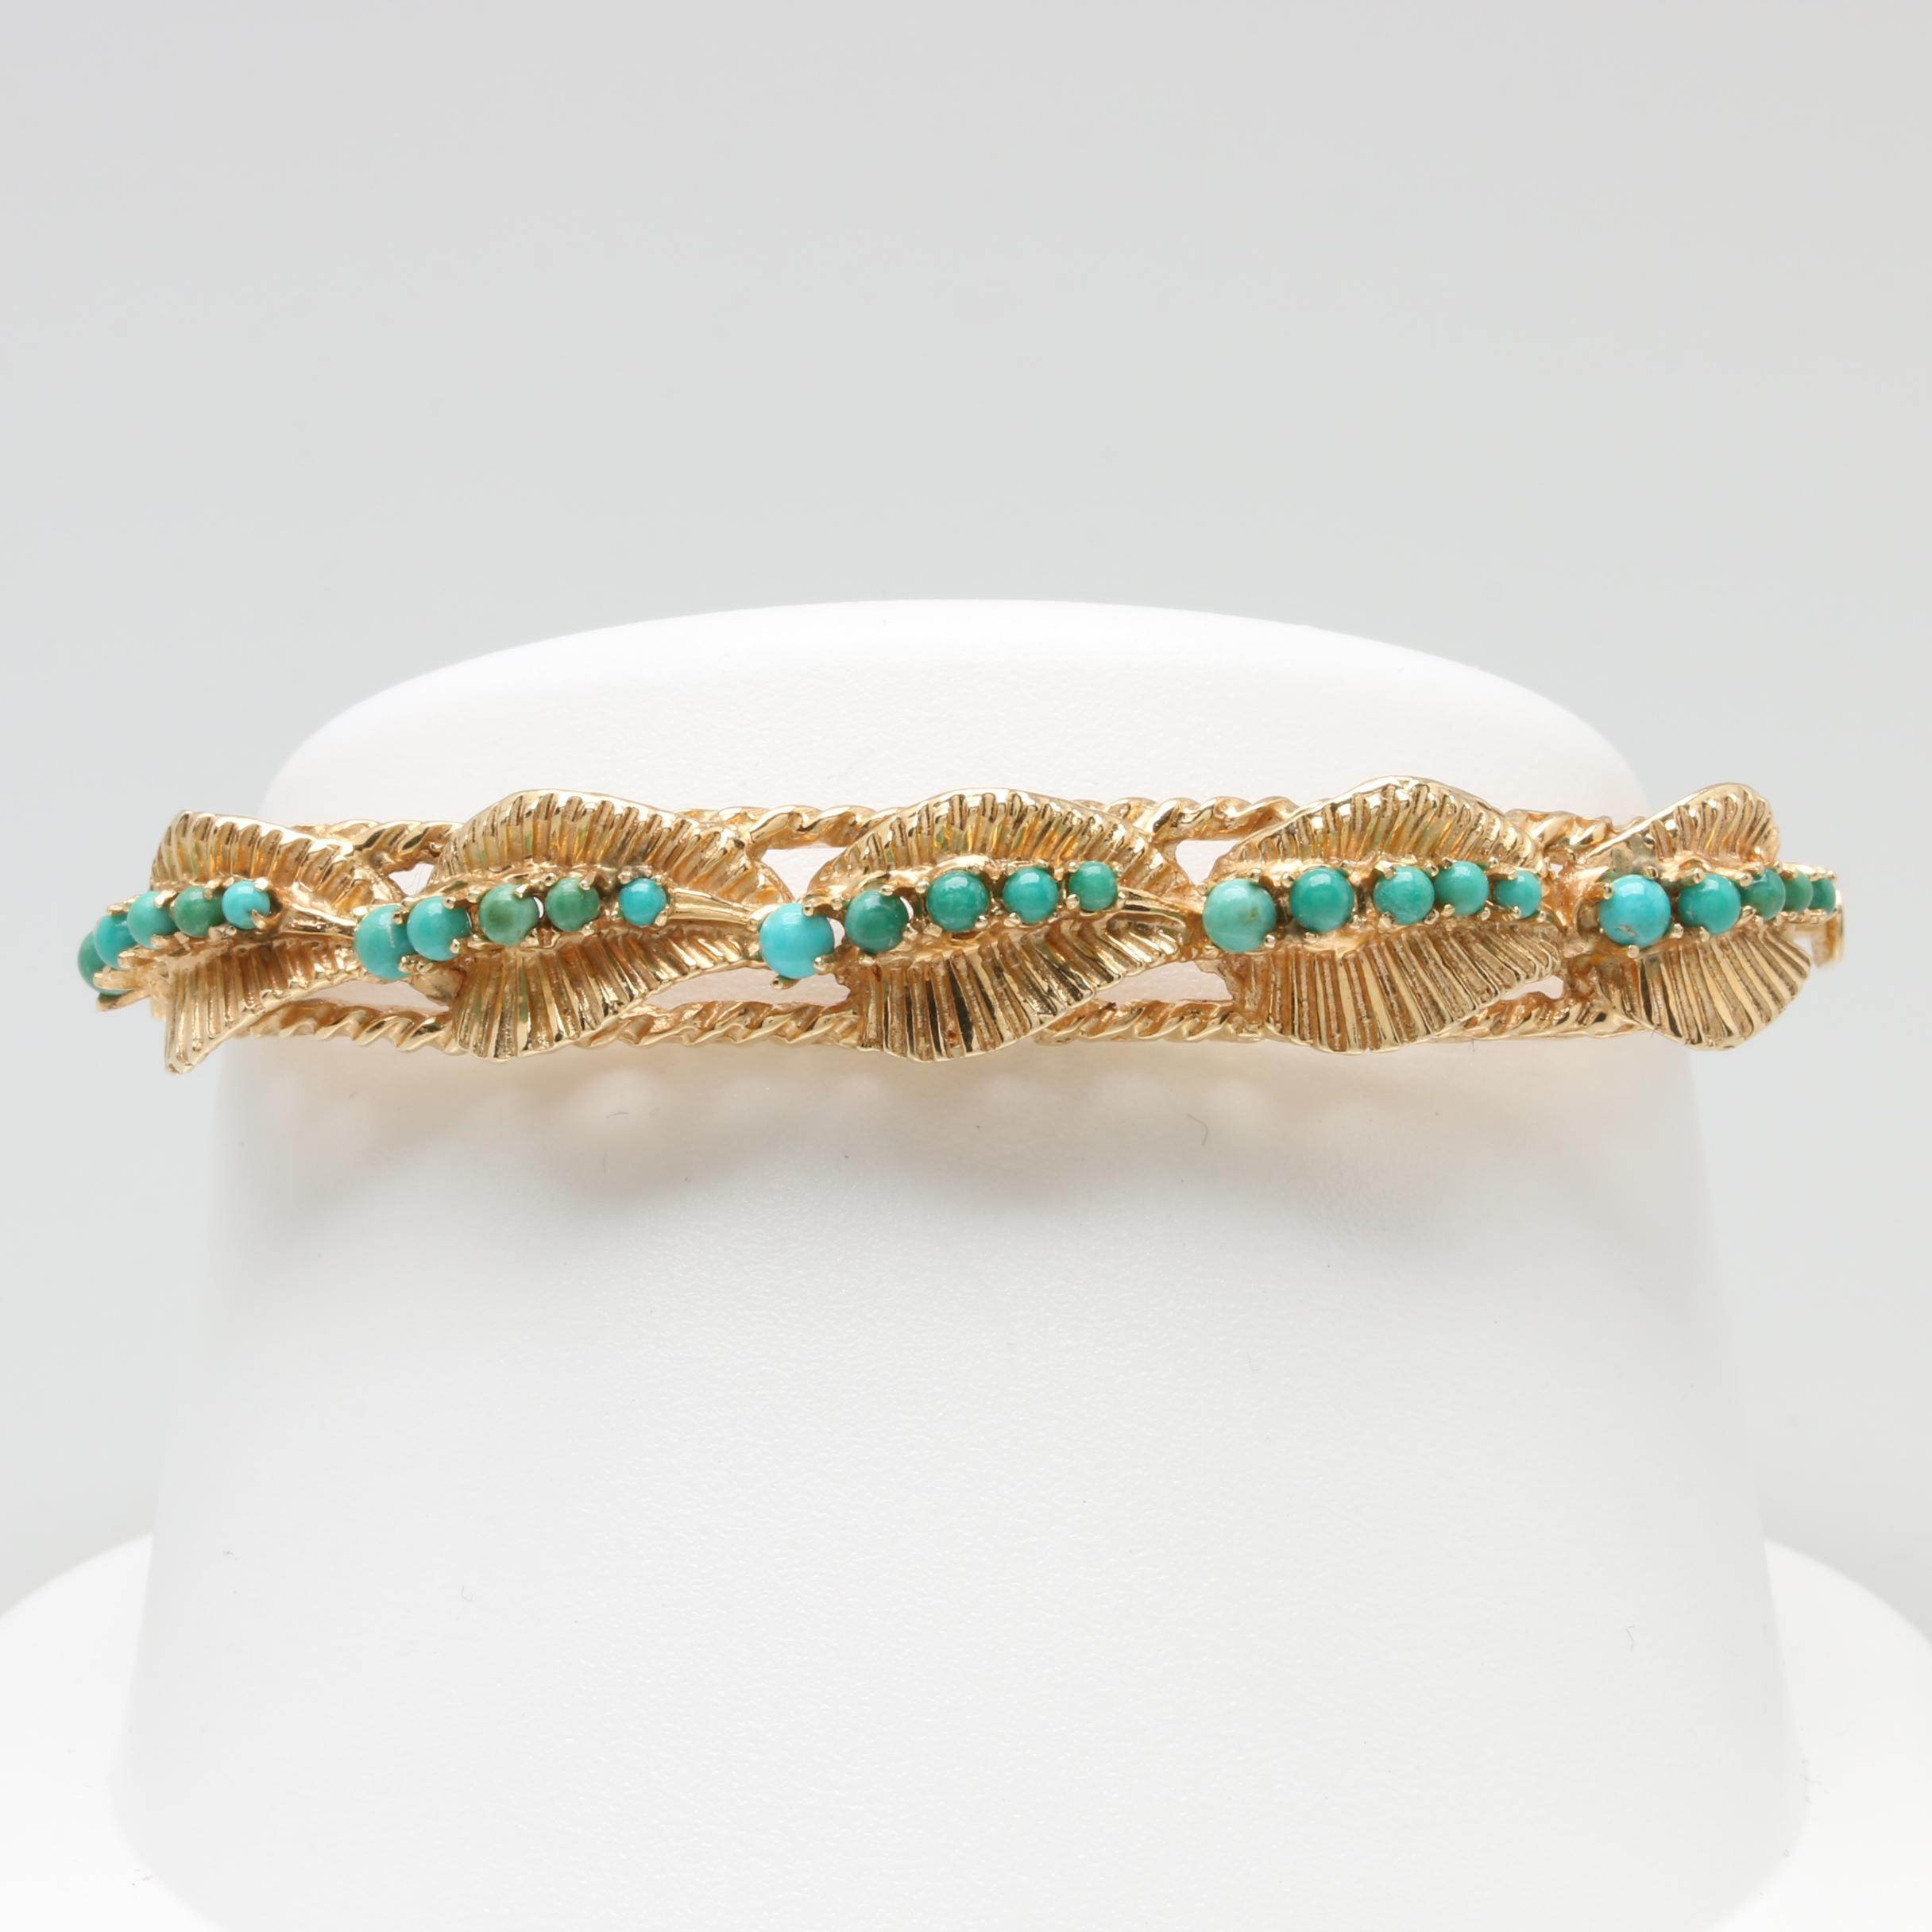 Vintage 14K Yellow Gold Turquoise Hinged Bracelet